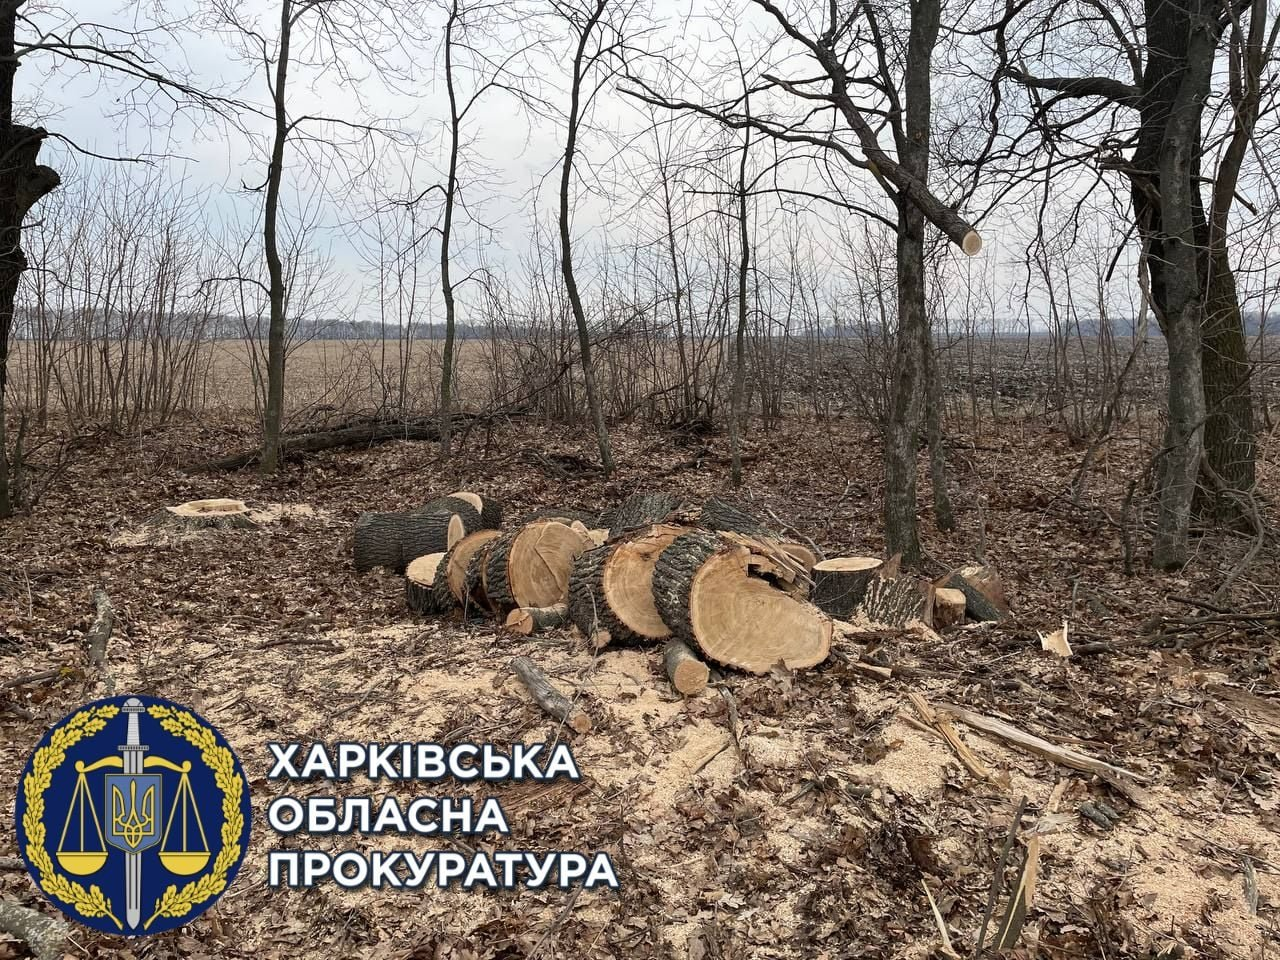 Фото: прокуратура Харьковщины